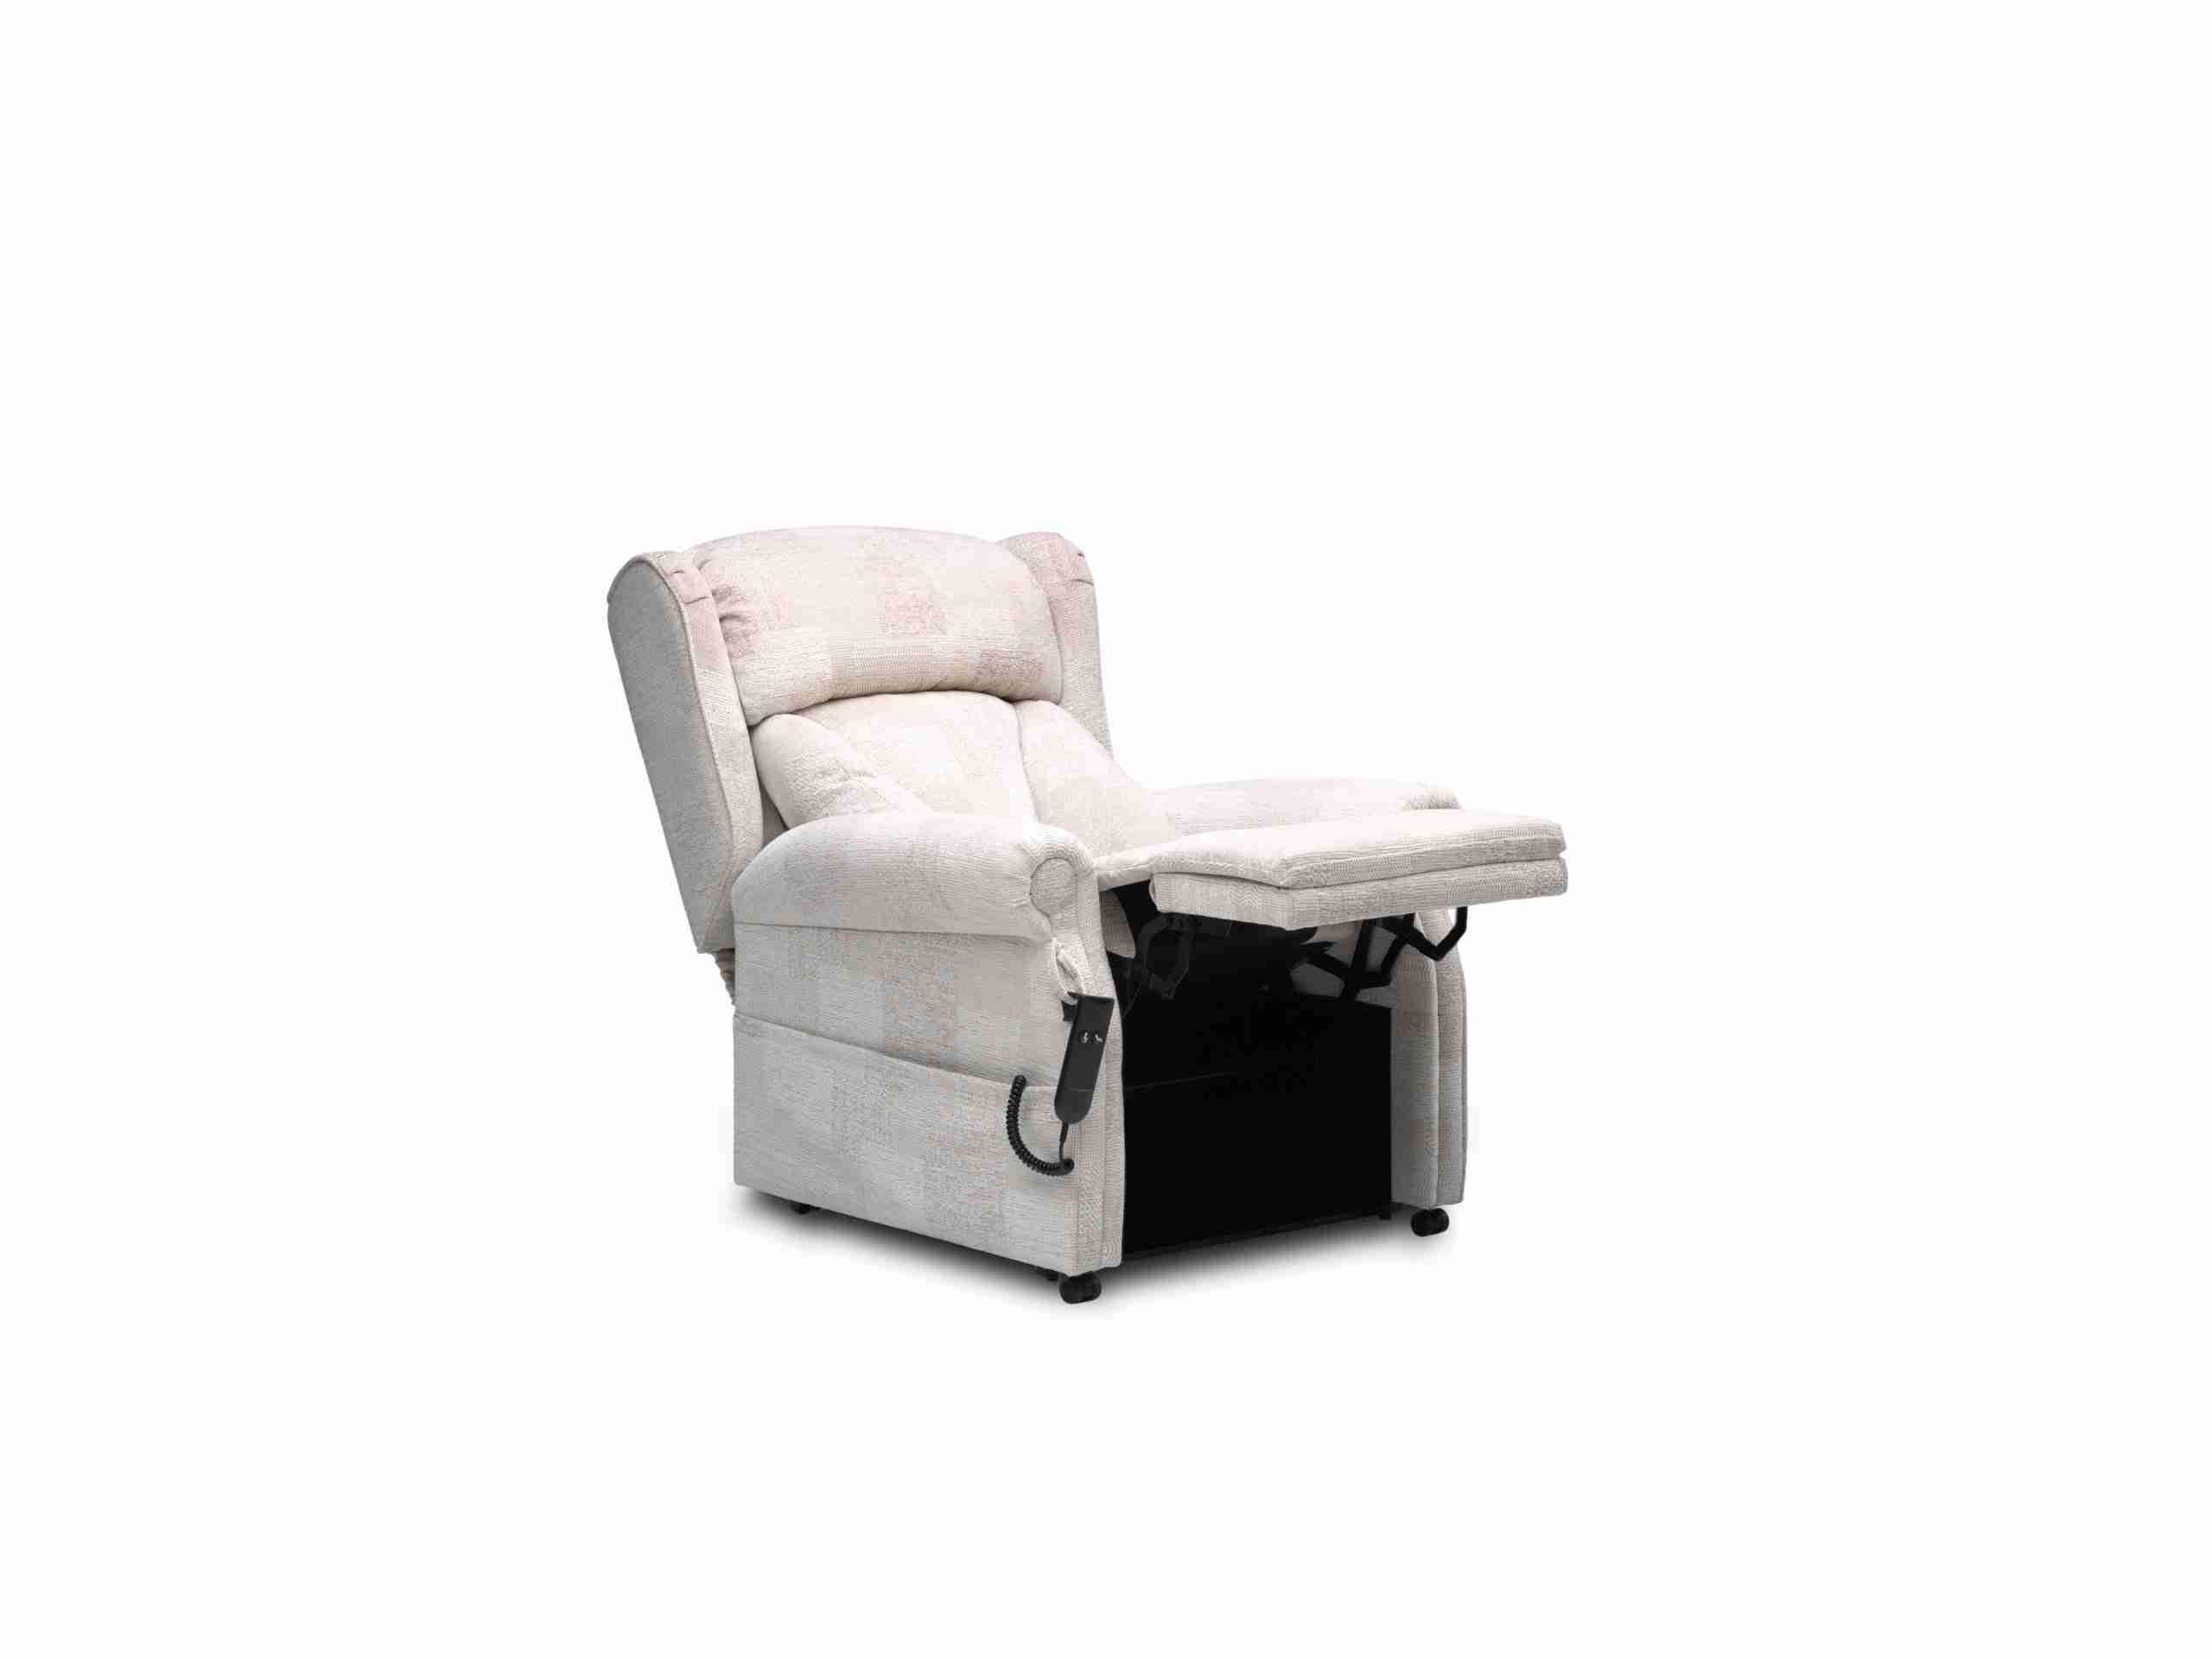 Chepstow Chair Repose04